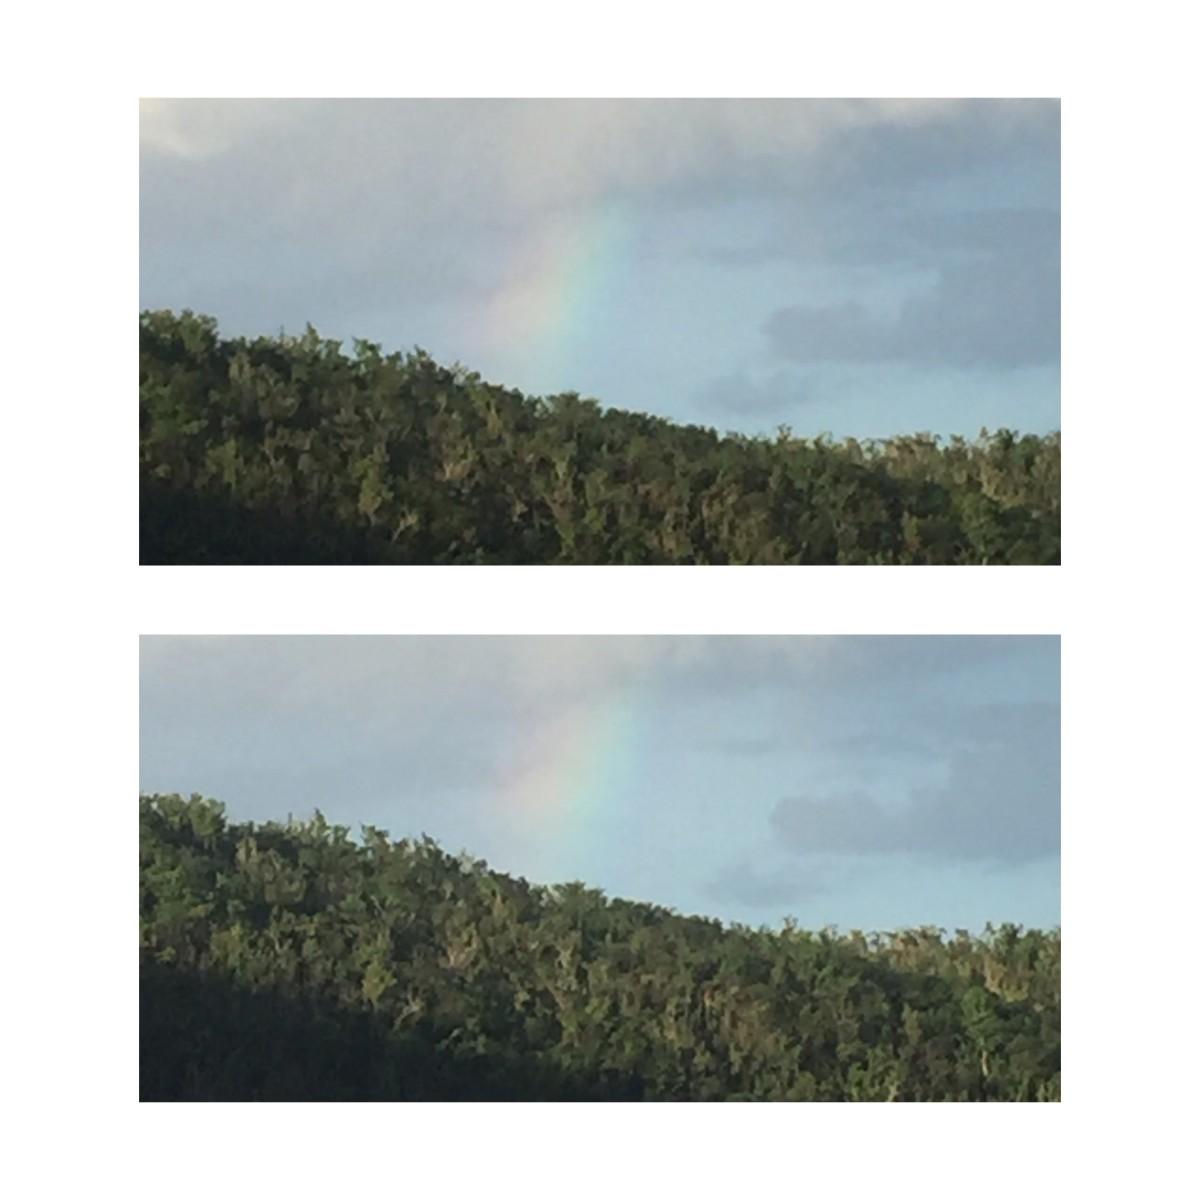 November 6, 2017 captured this rainbow sneaking around the mountain top. Got it, nice!